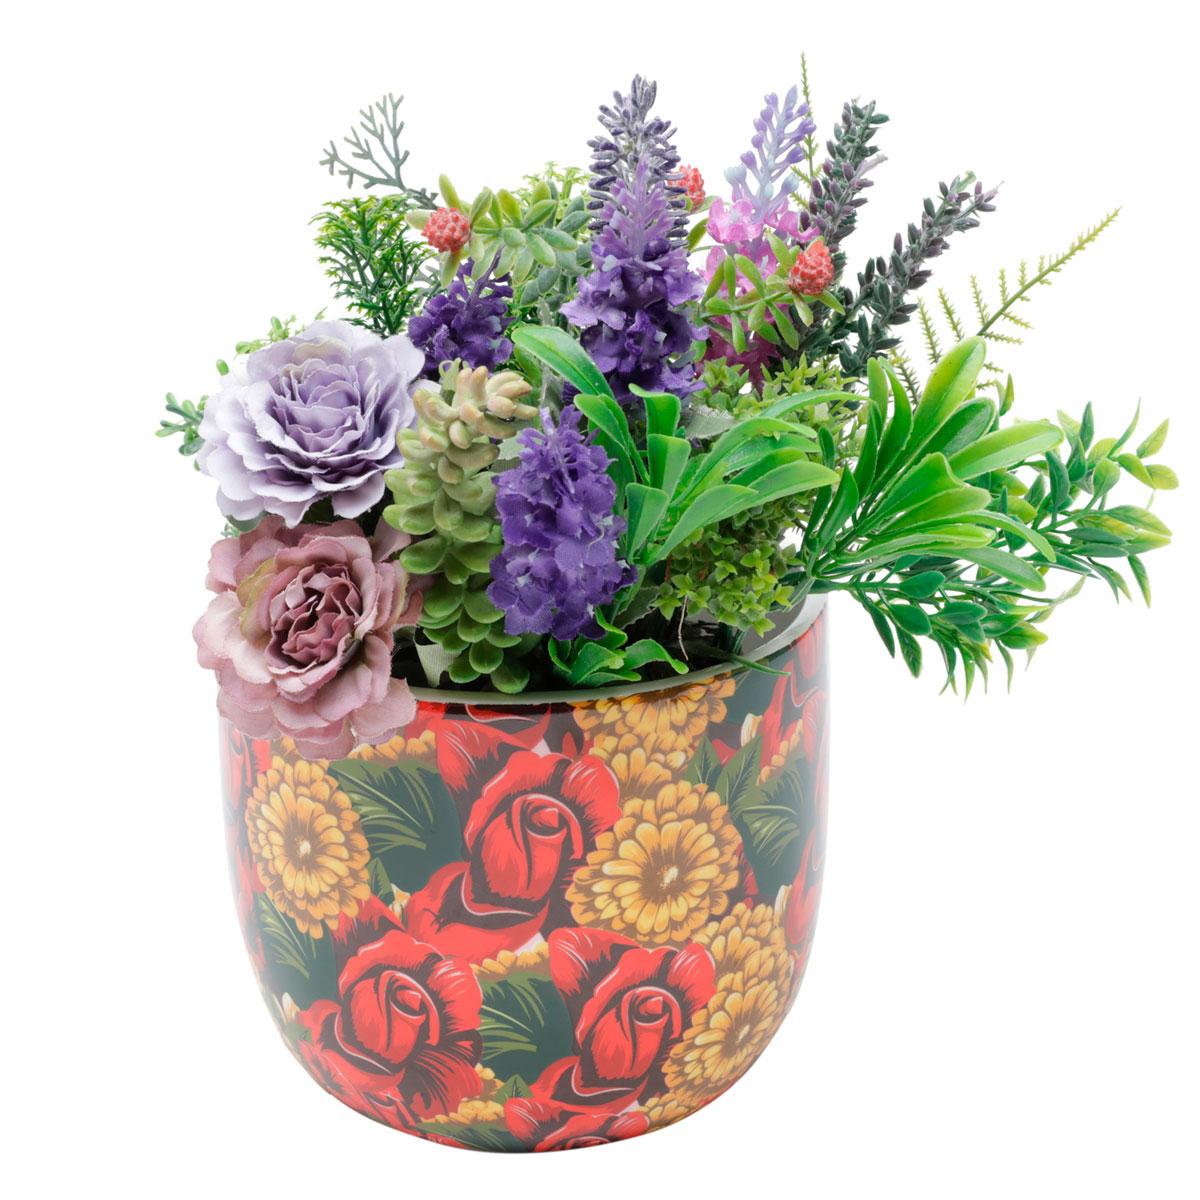 Cachepot Vaso Decorativo de Cerâmica Frida Kahlo Yellow Flower - Presente Super